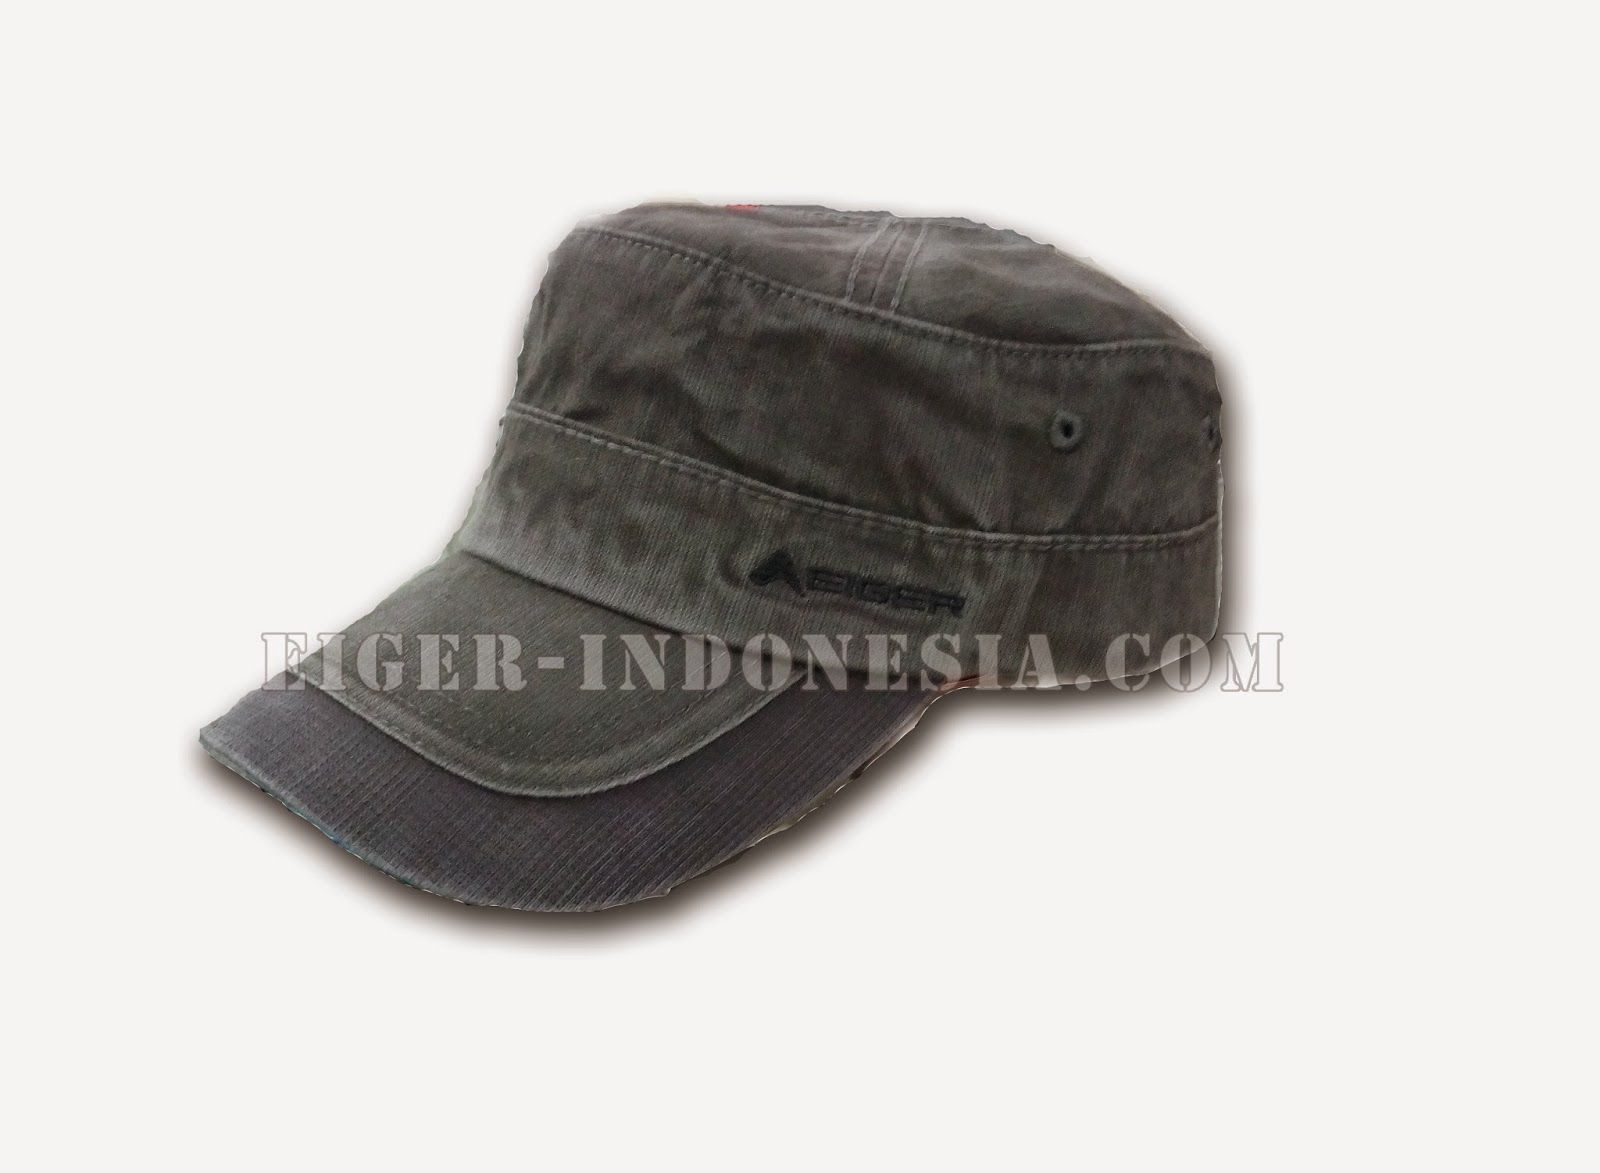 http://www.eiger-indonesia.com/2014/10/topi-neo-commander-t571.html